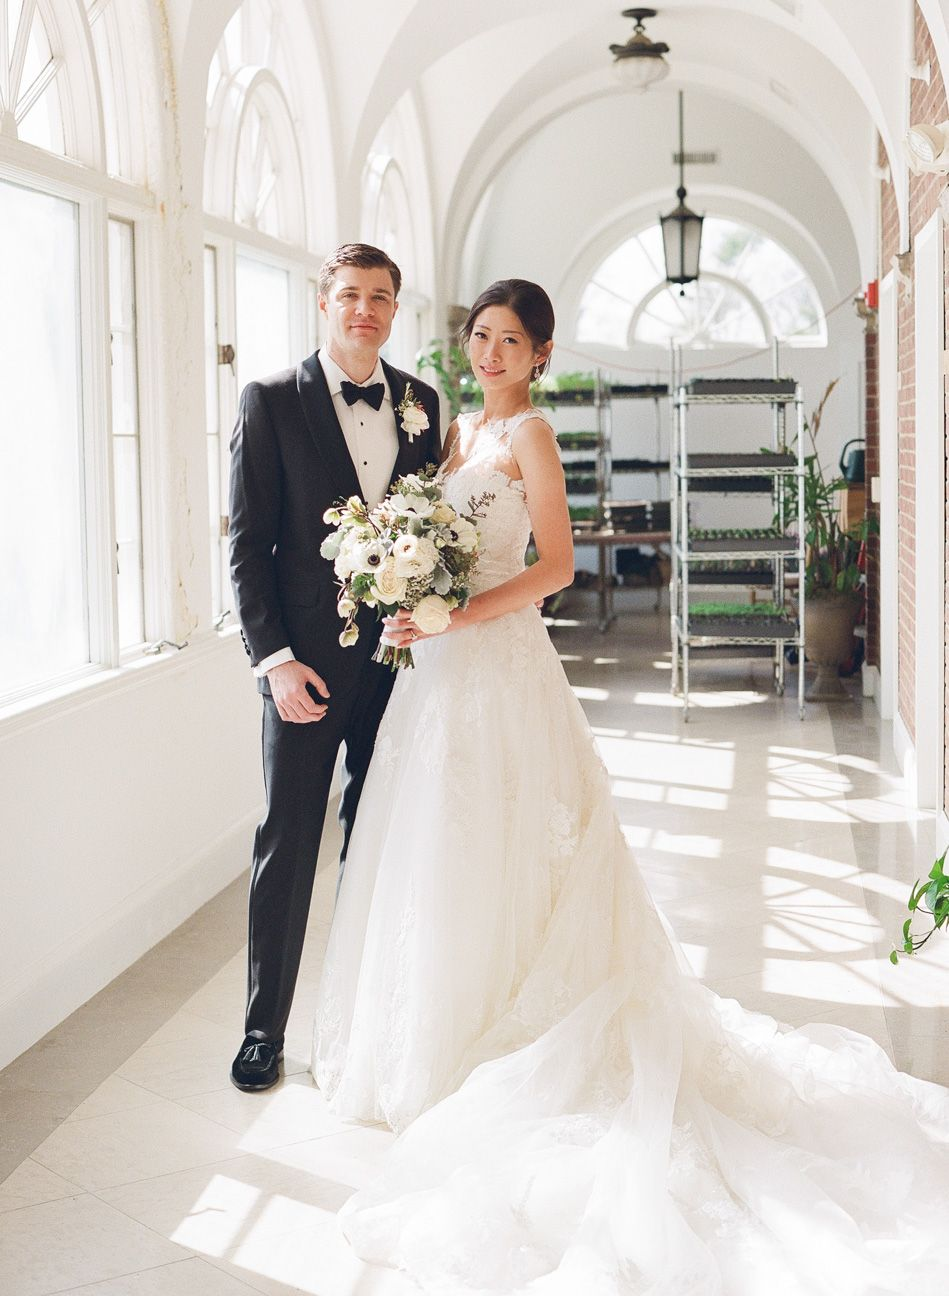 KarenHillPhotography-Zhu-Wedding-0231.jpg